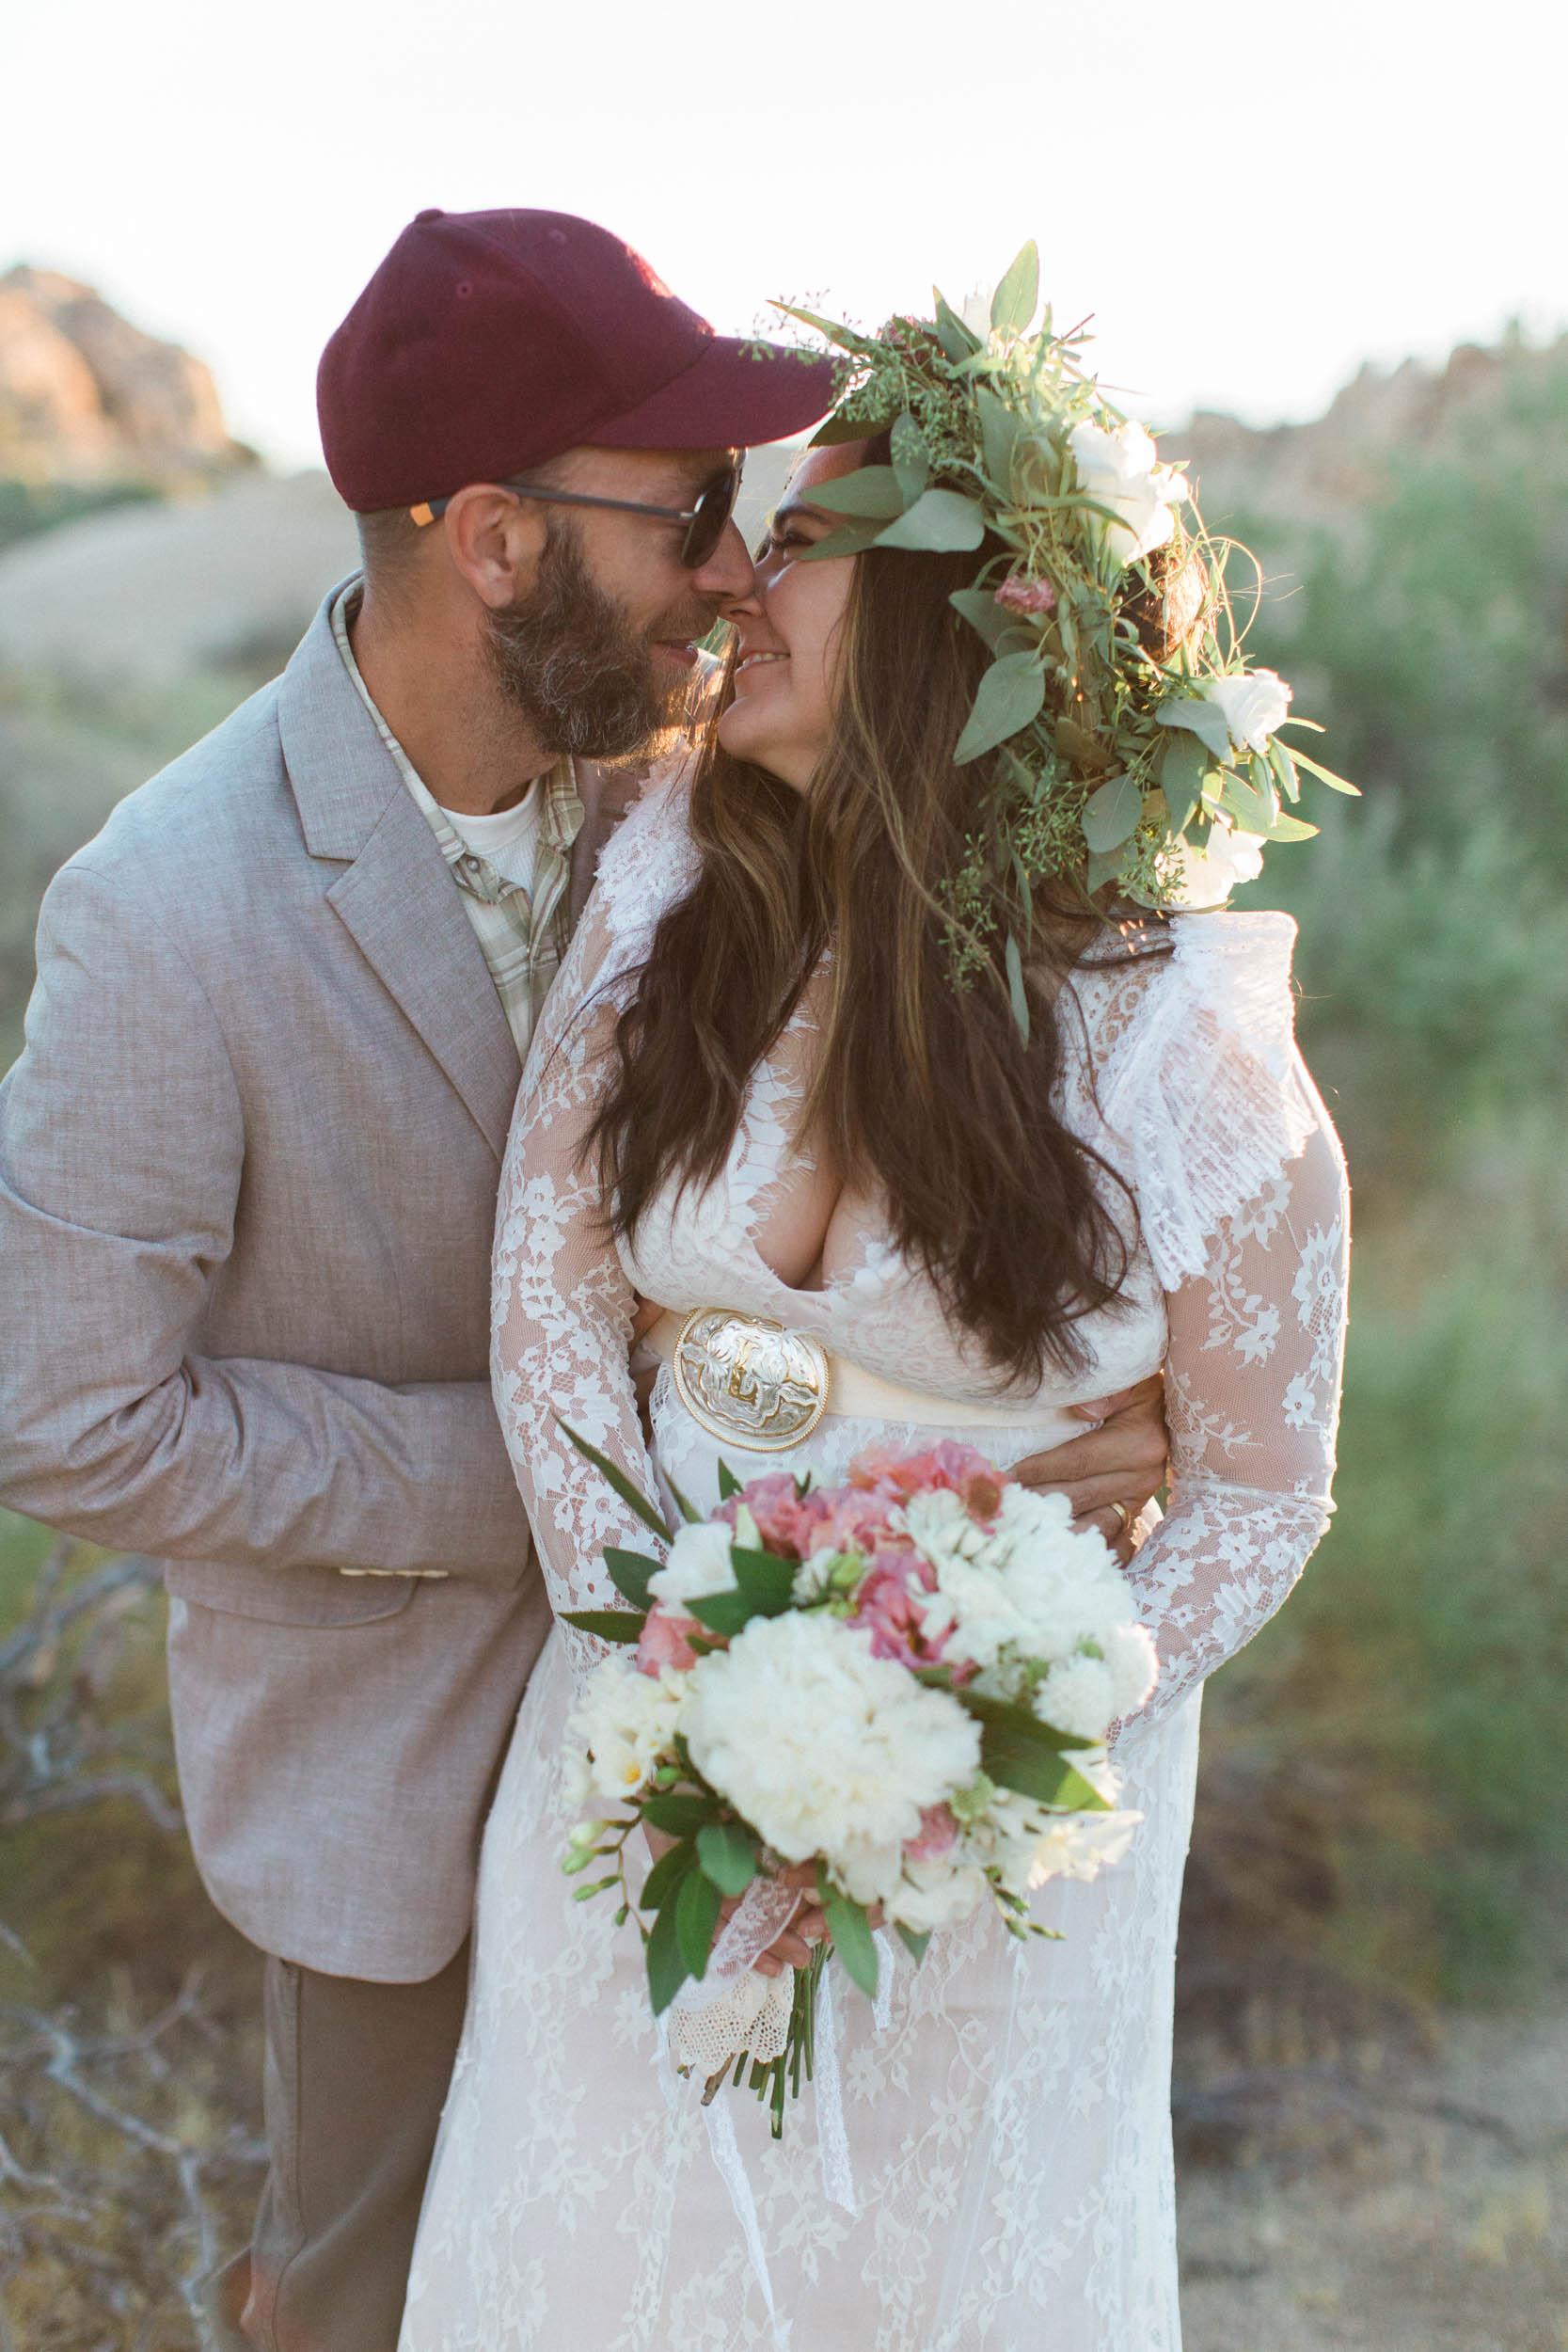 BKM-Photography-Joshua-Tree-Desert-Wedding-Elopement-0013.jpg